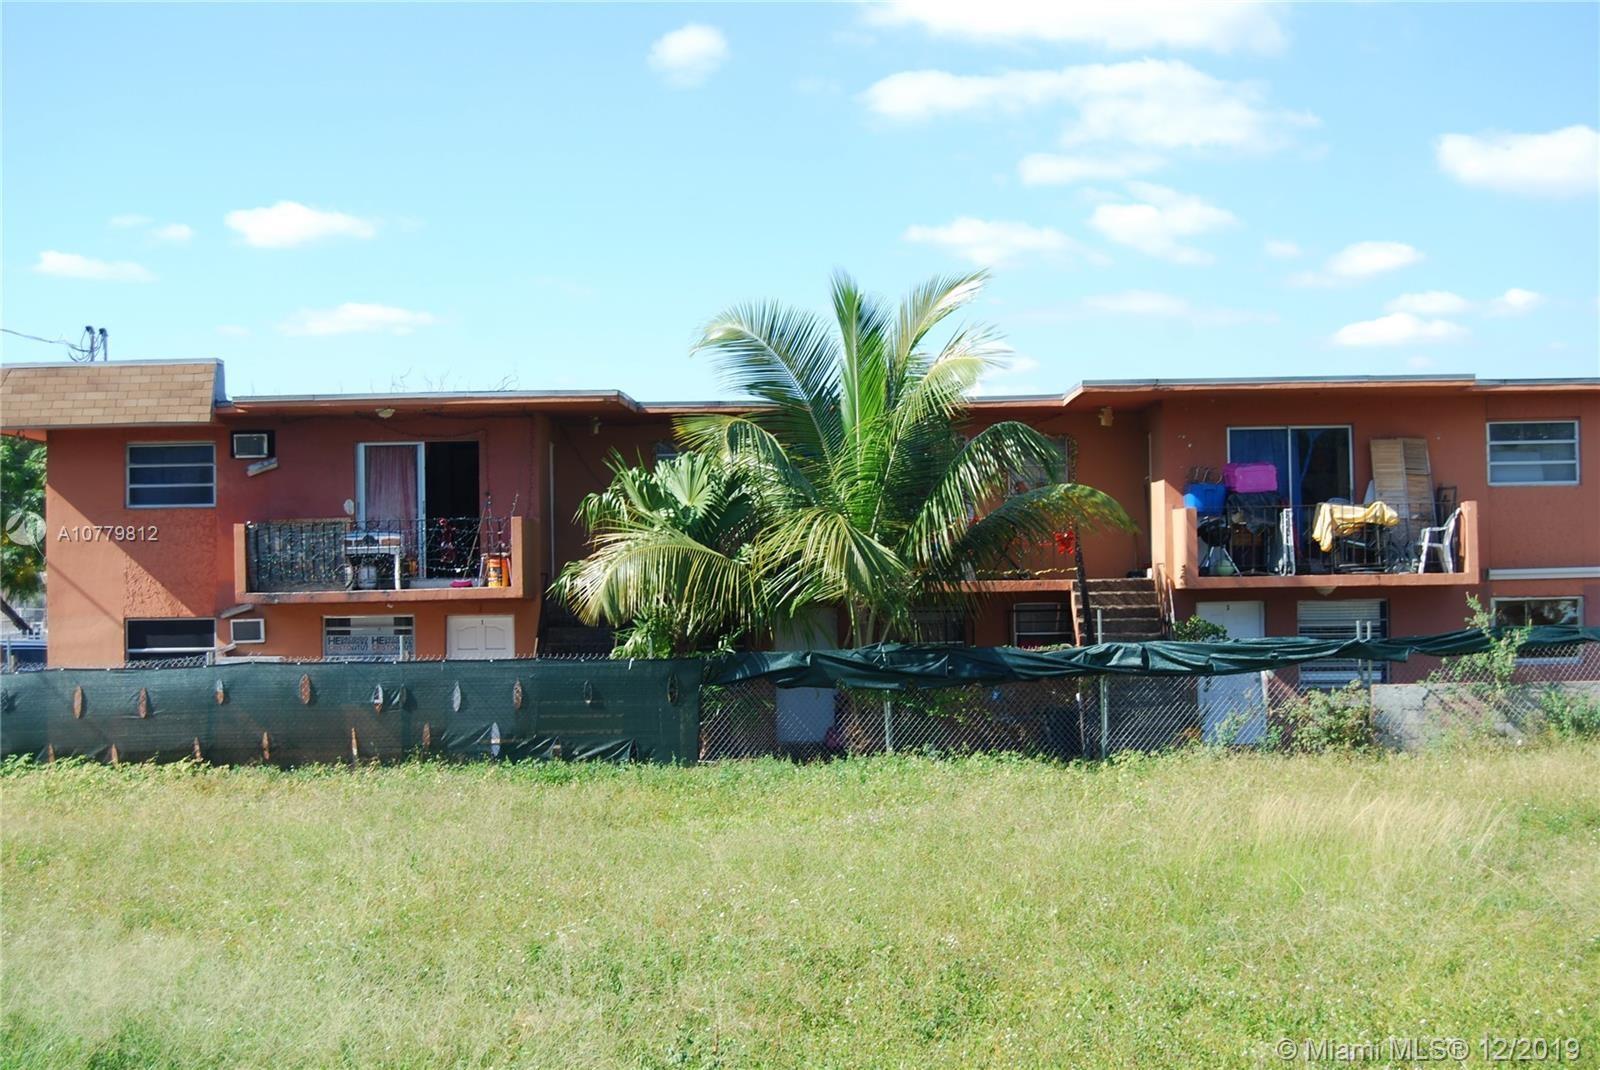 721 SW 3rd St, Miami, FL 33130